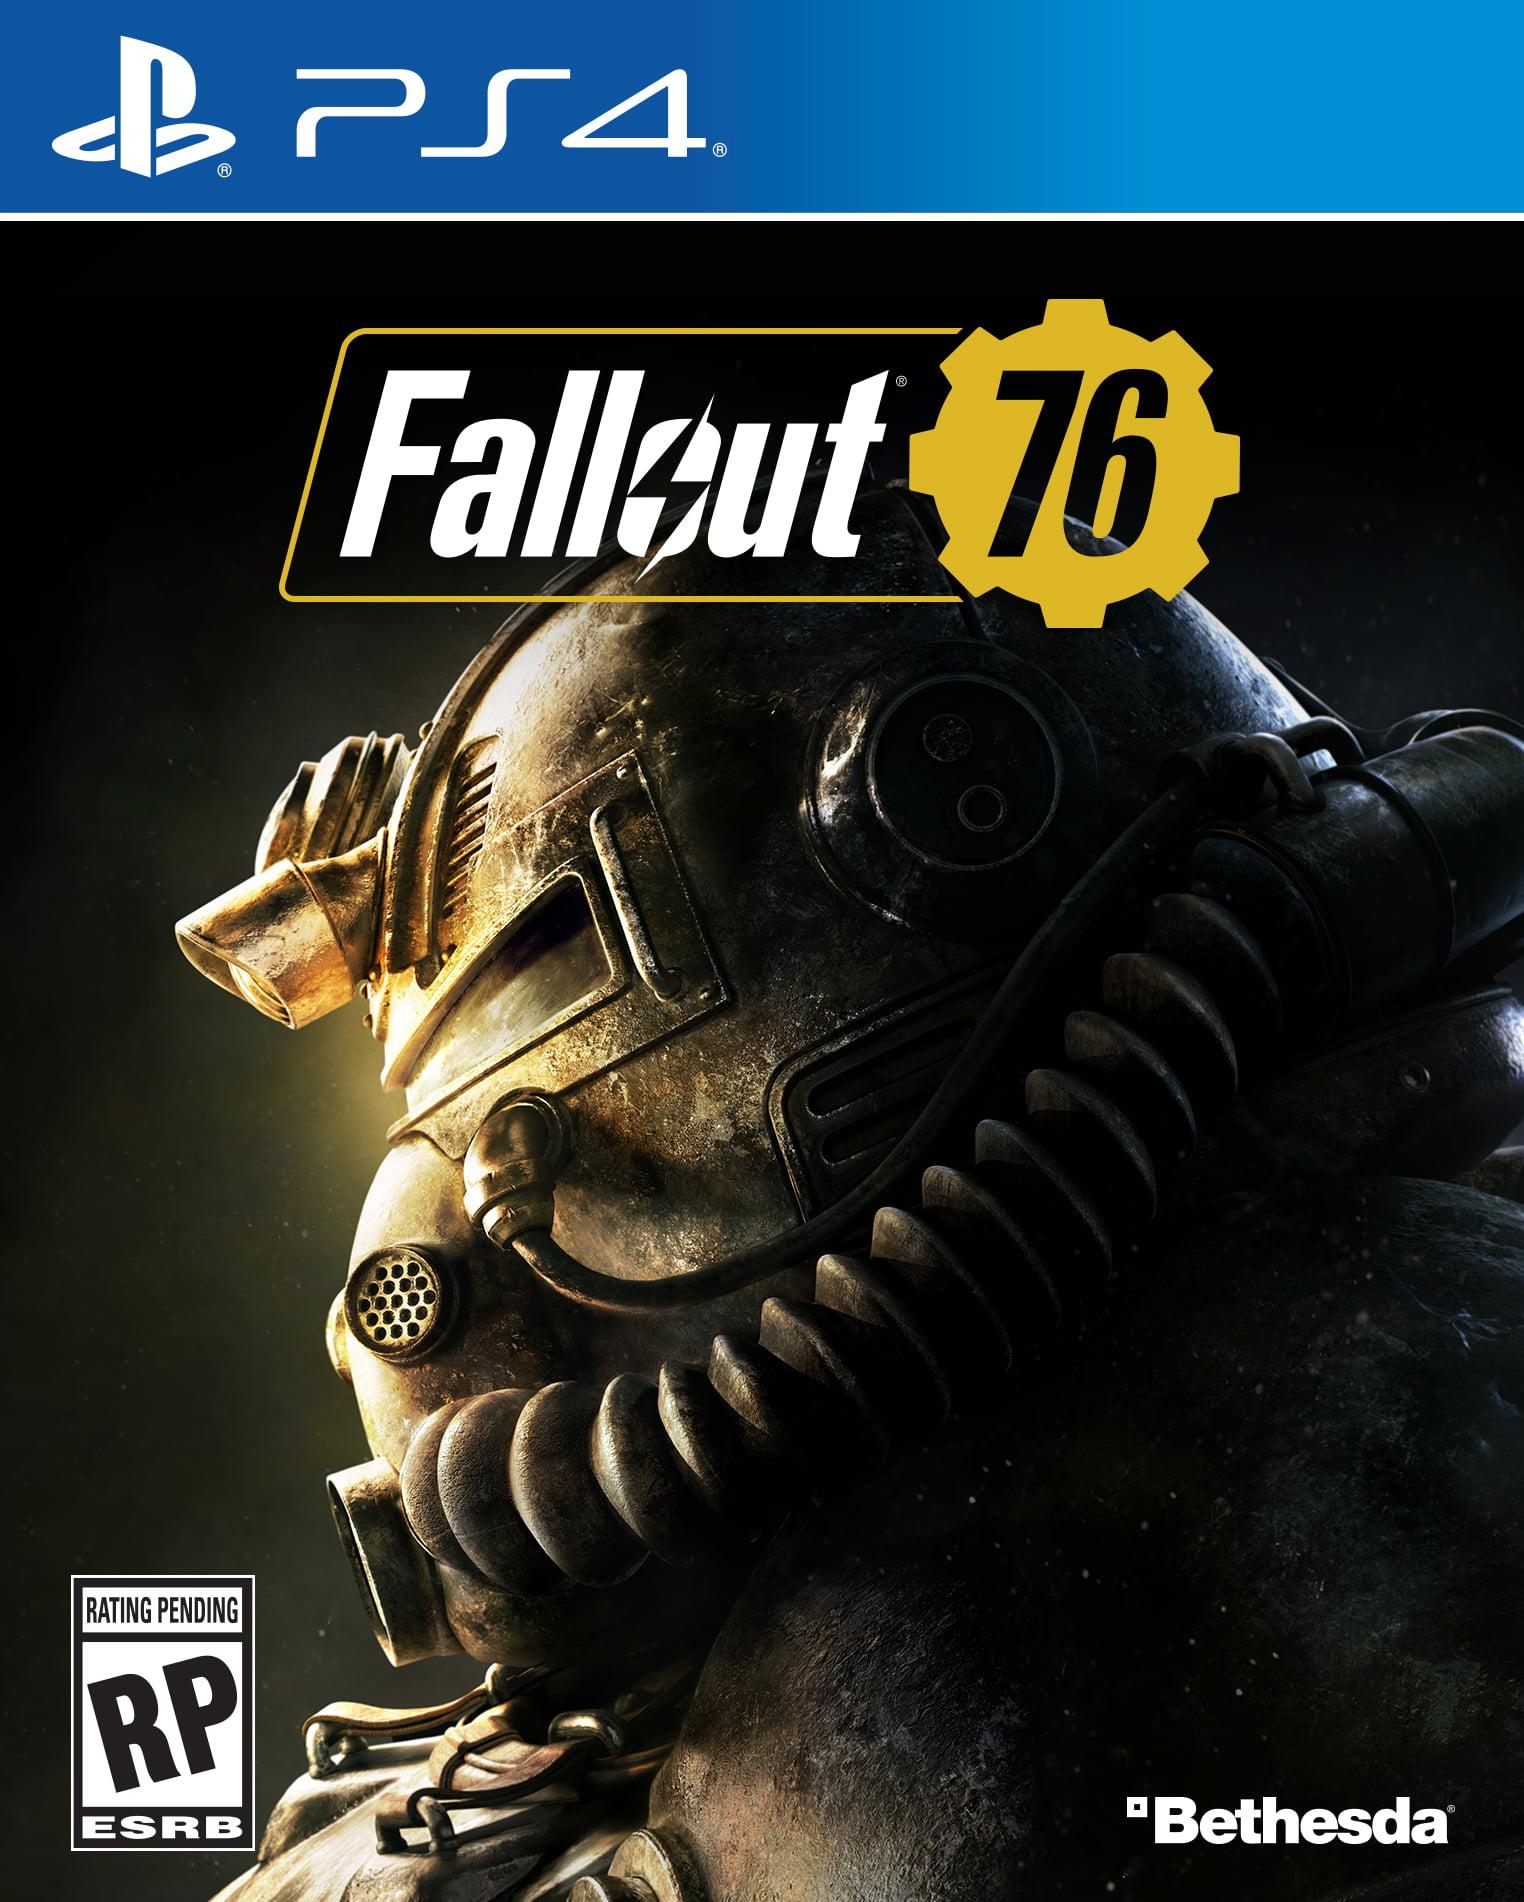 Fallout 76, Bethesda, Playstation 4, 093155173057 by Bethesda